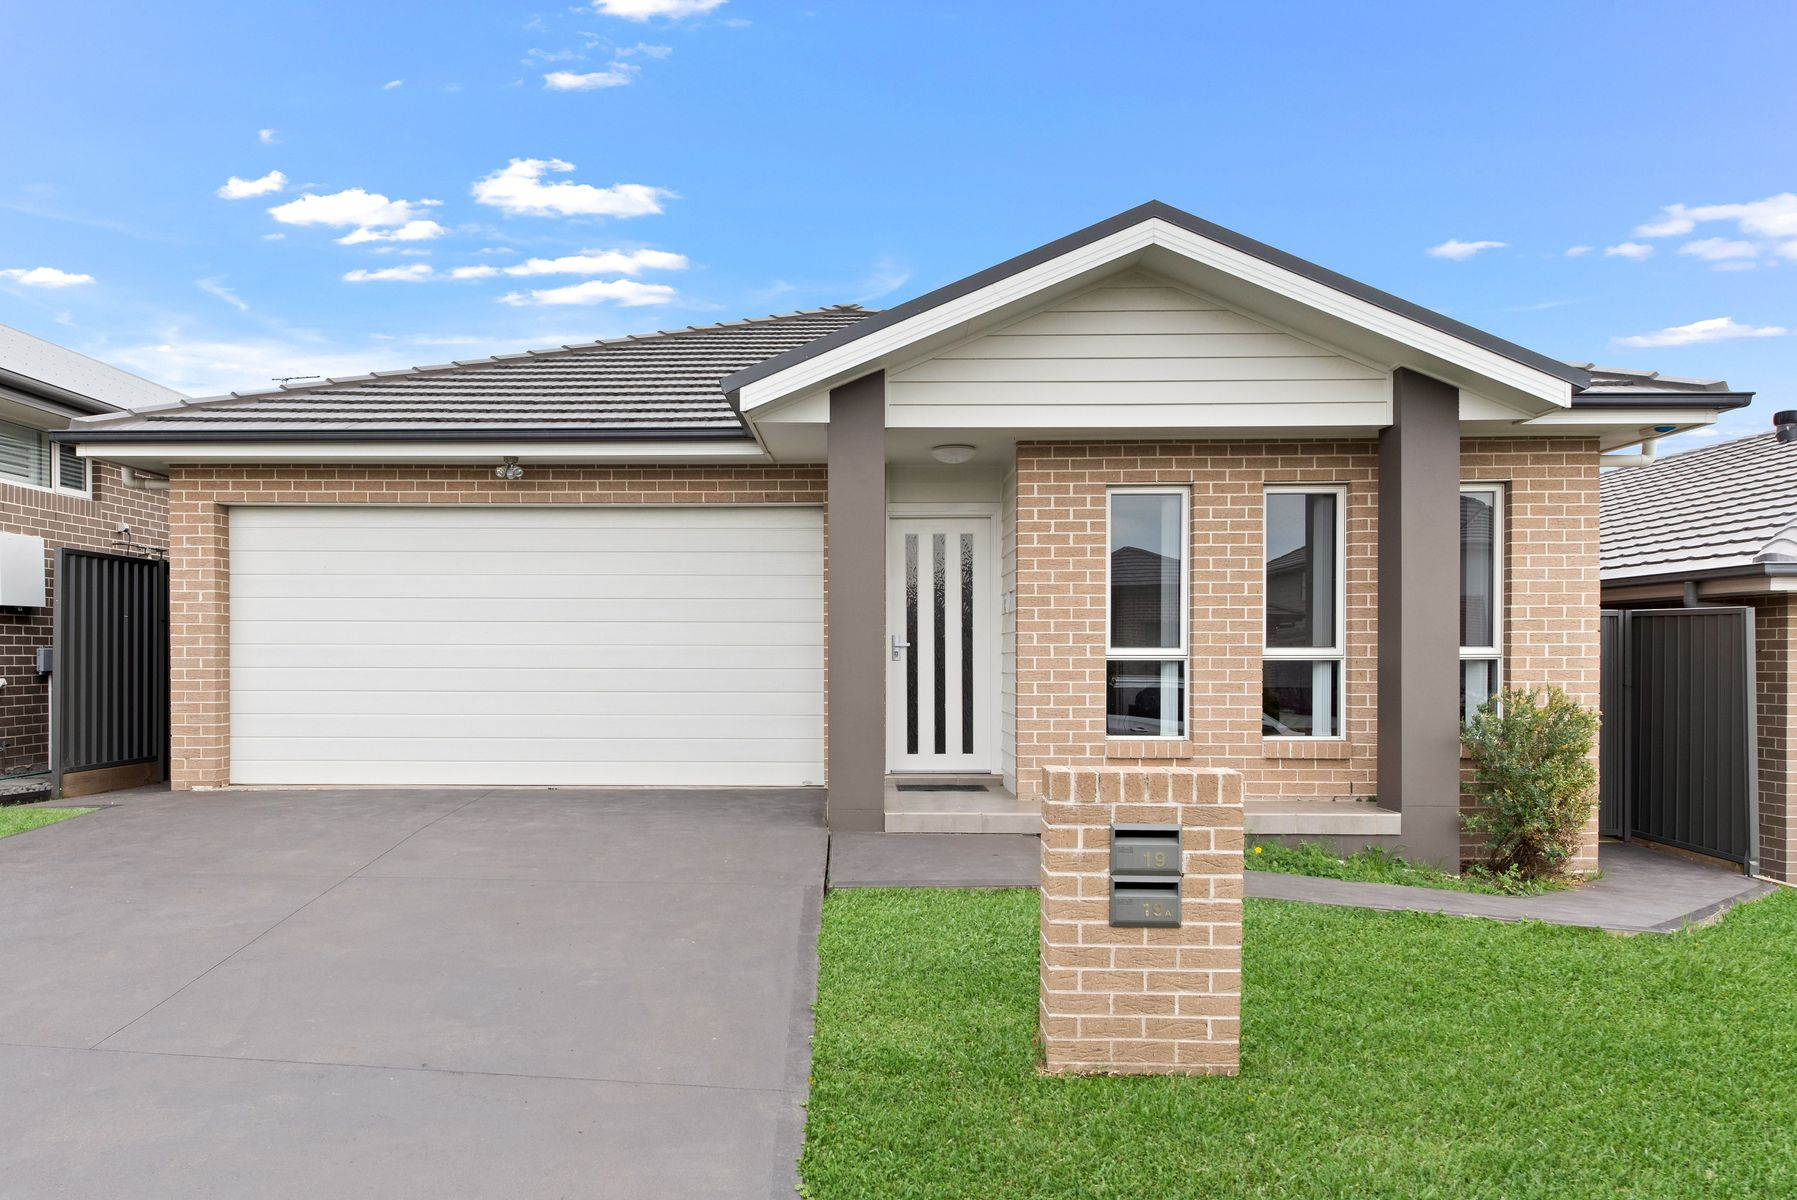 19 Rover Street, Leppington, NSW 2179